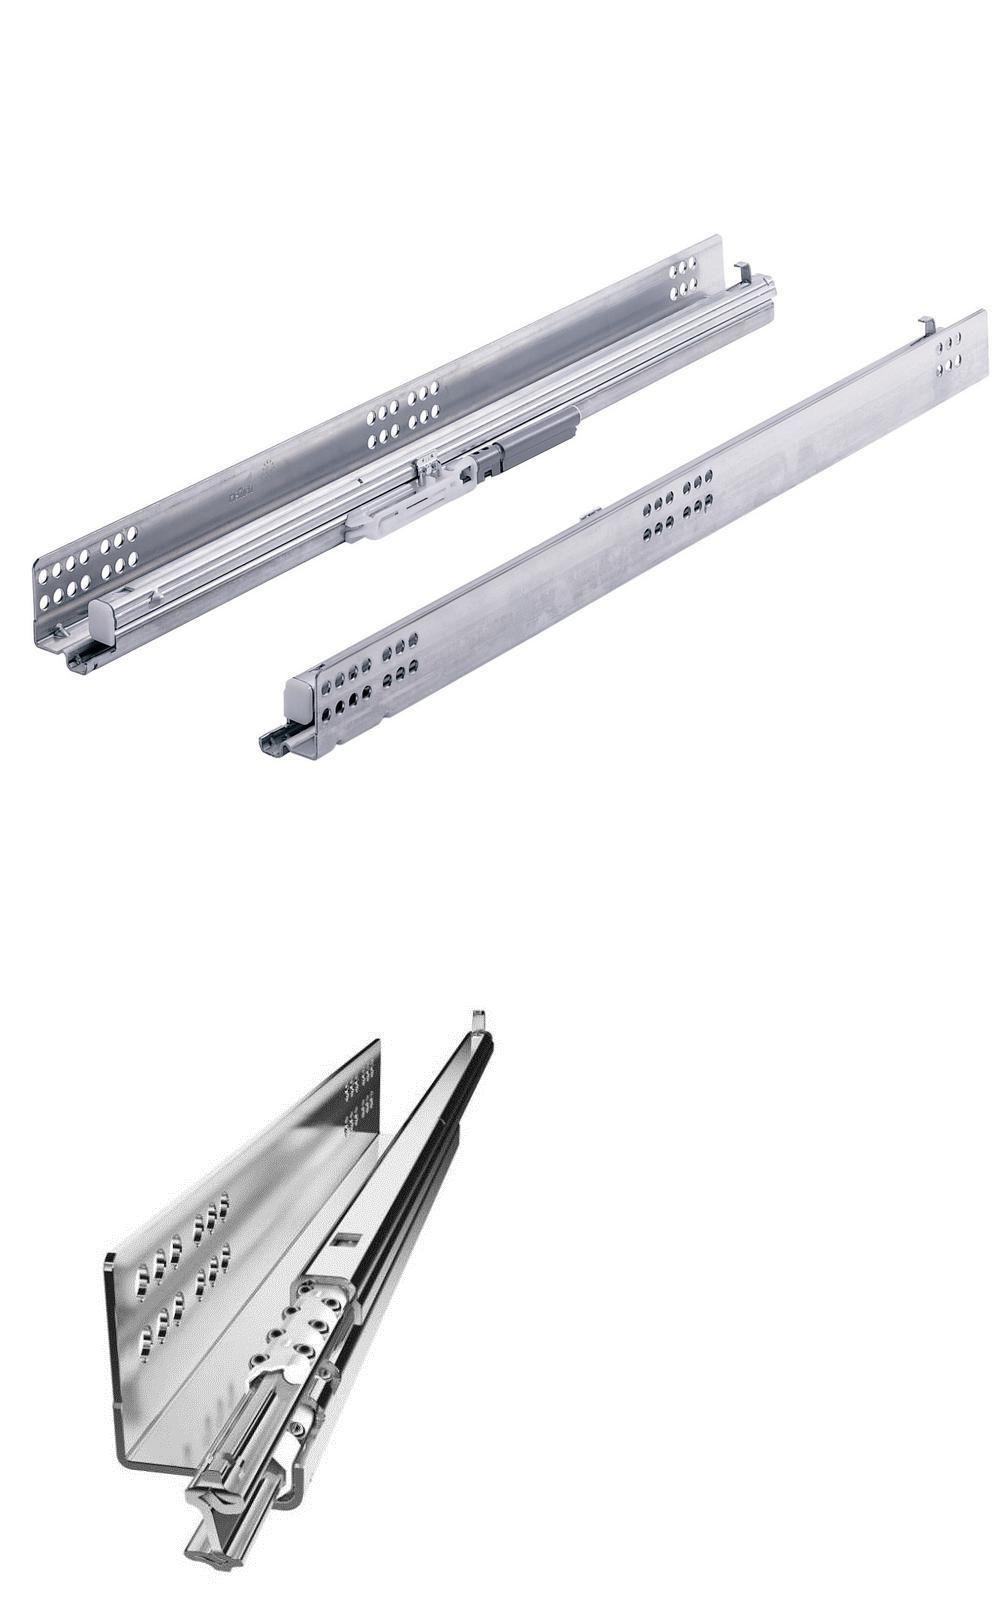 Drawer Slides 134642 Everbilt 15 Full Extension Undermount Soft Close Slide Set Lot Of 2 9236059 Buy It No Soft Close Drawer Slides Drawer Slides Drawers